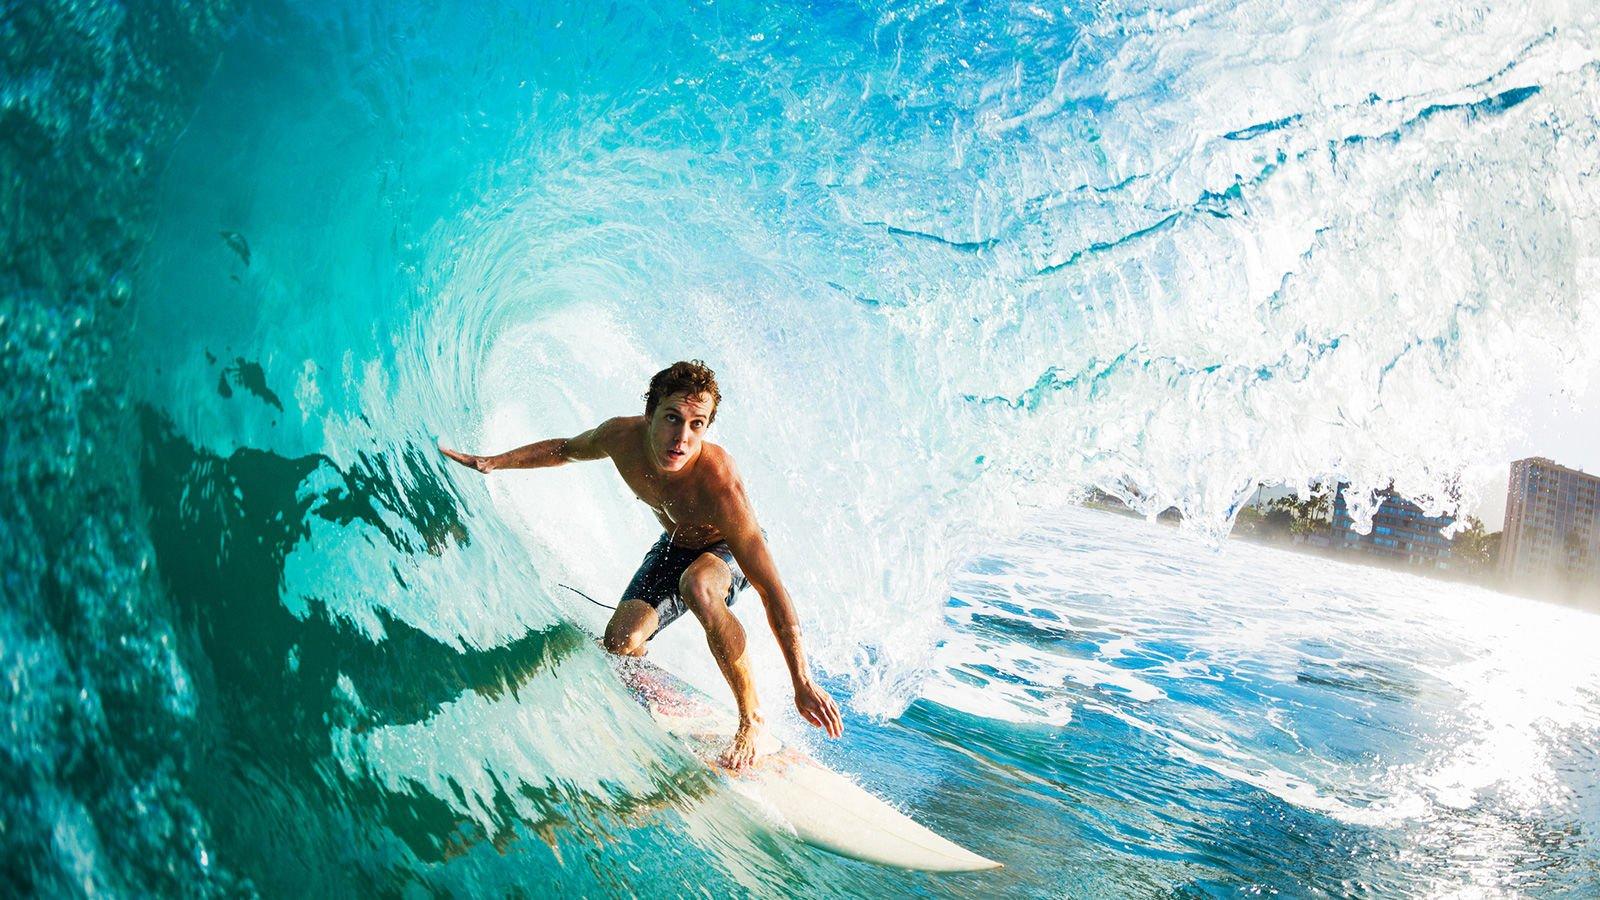 Sörf yapan adam